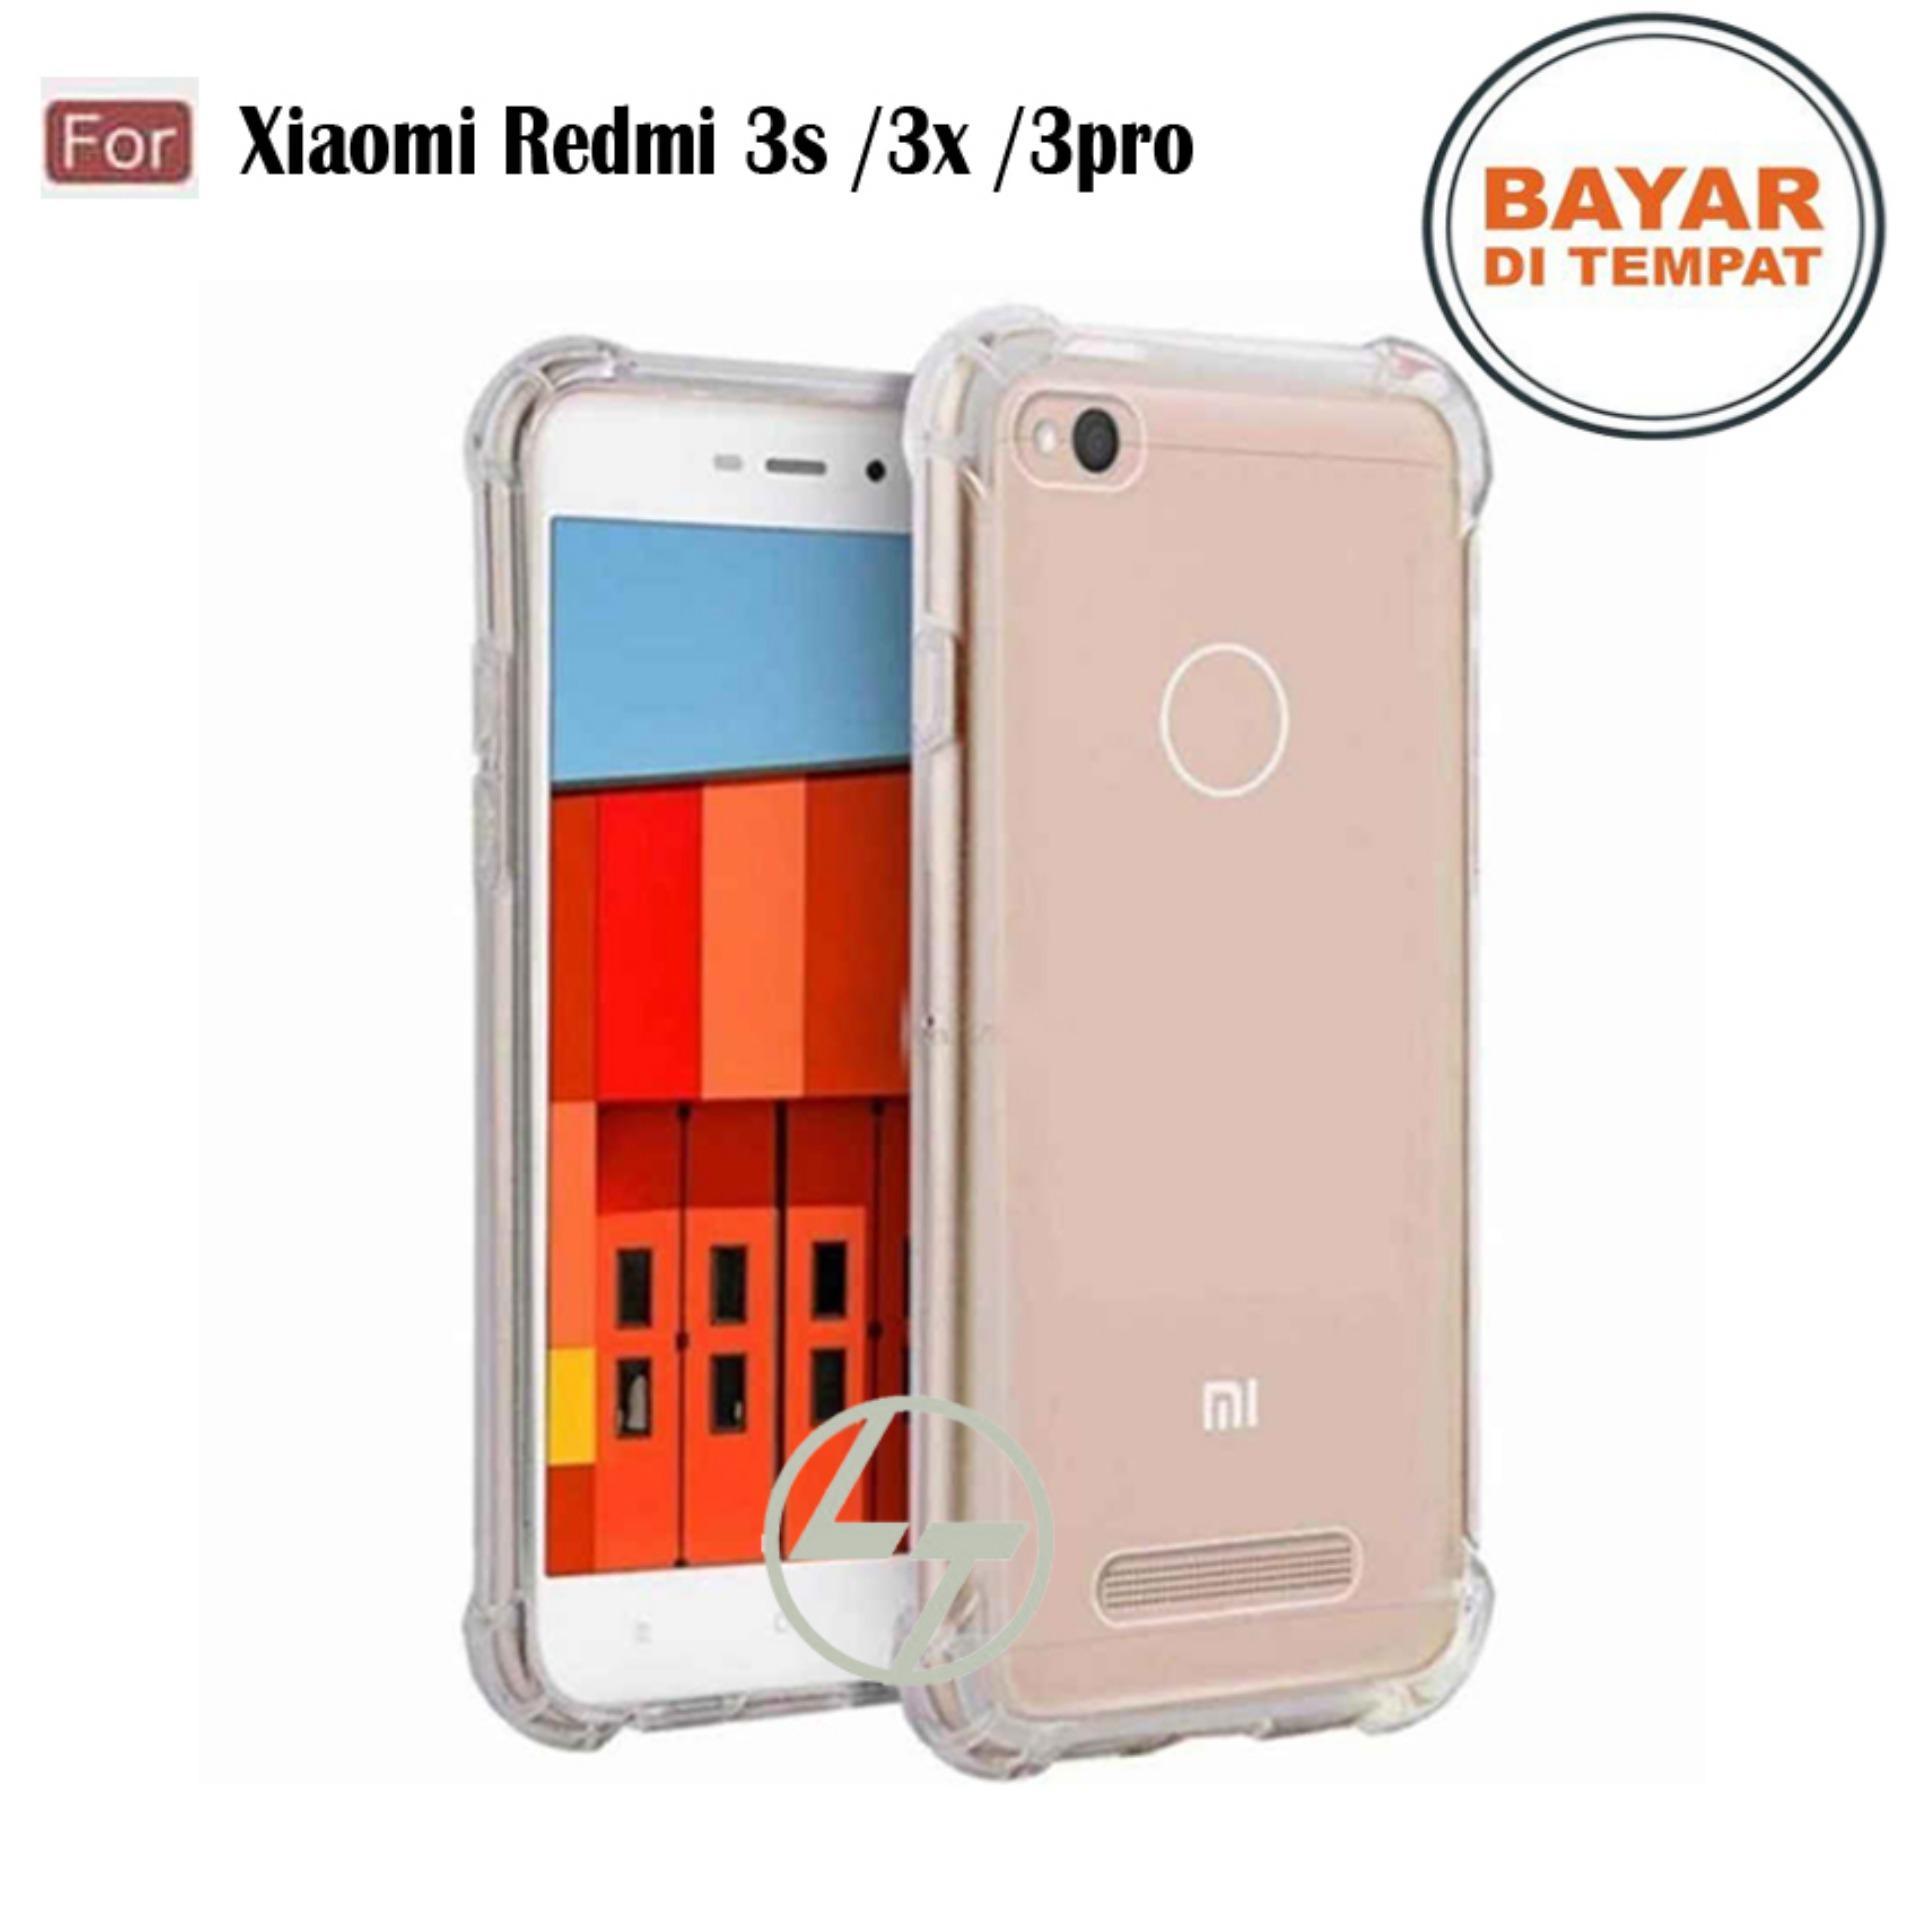 Rp 6.174. Lapak Case - Softcase Anti Crack Silikon Casing Anticrack Anti Bentur Terbaik Untuk Xiaomi Redmi 3s / Redmi 3 ProIDR6174